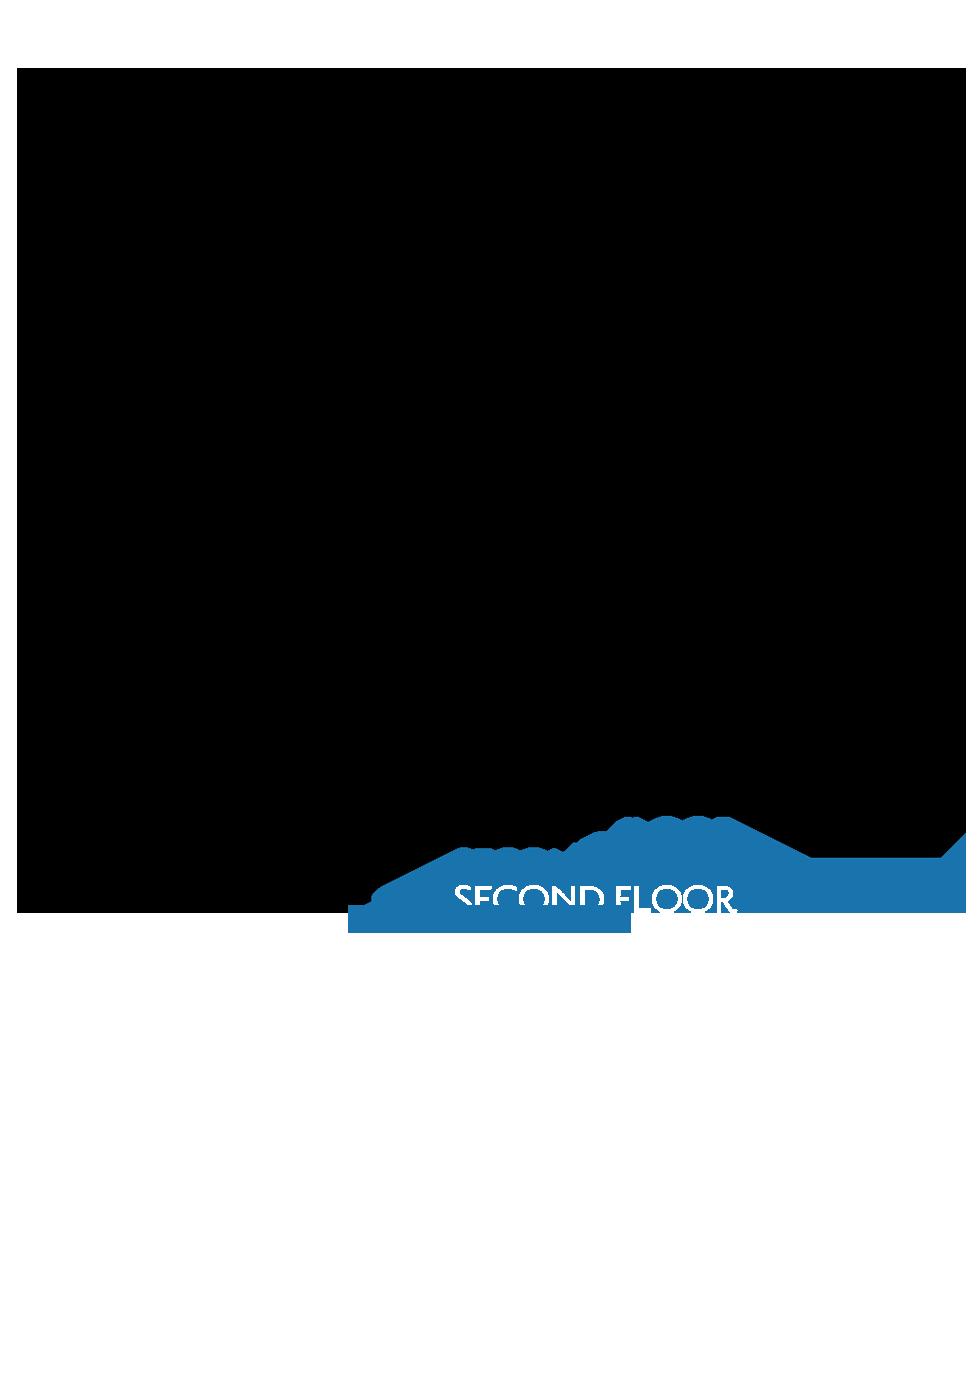 Splash at One Lake Floor Plan   Residence 2   Floor 2